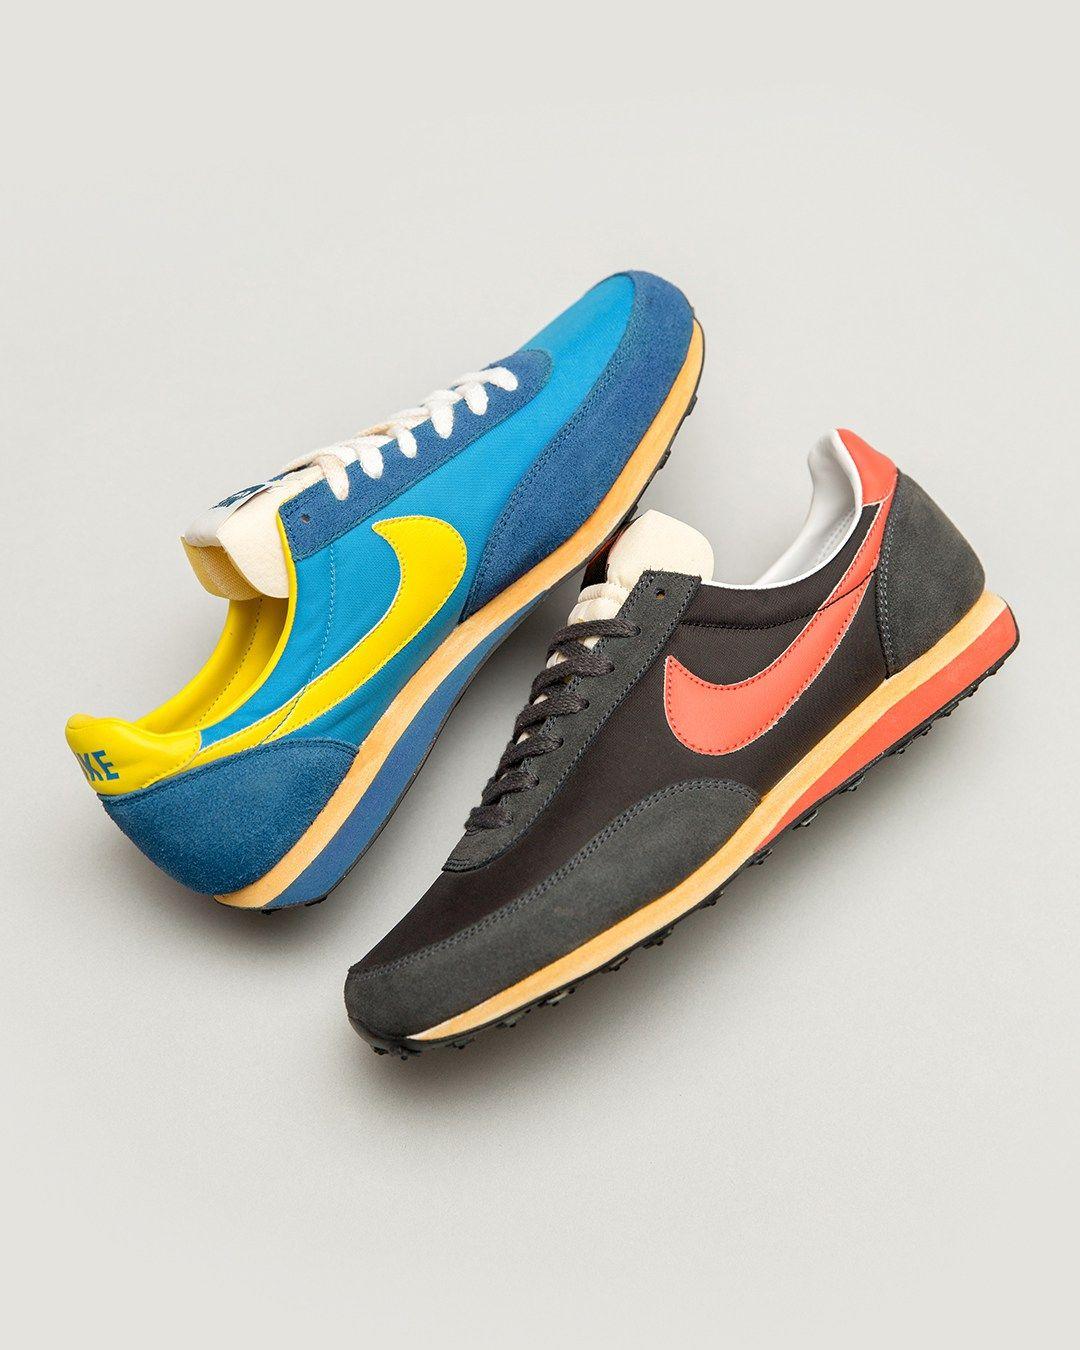 c337dd9e382 Nike Elite OG  size  Exclusive Pack - EUKicks.com Sneaker Magazine ...